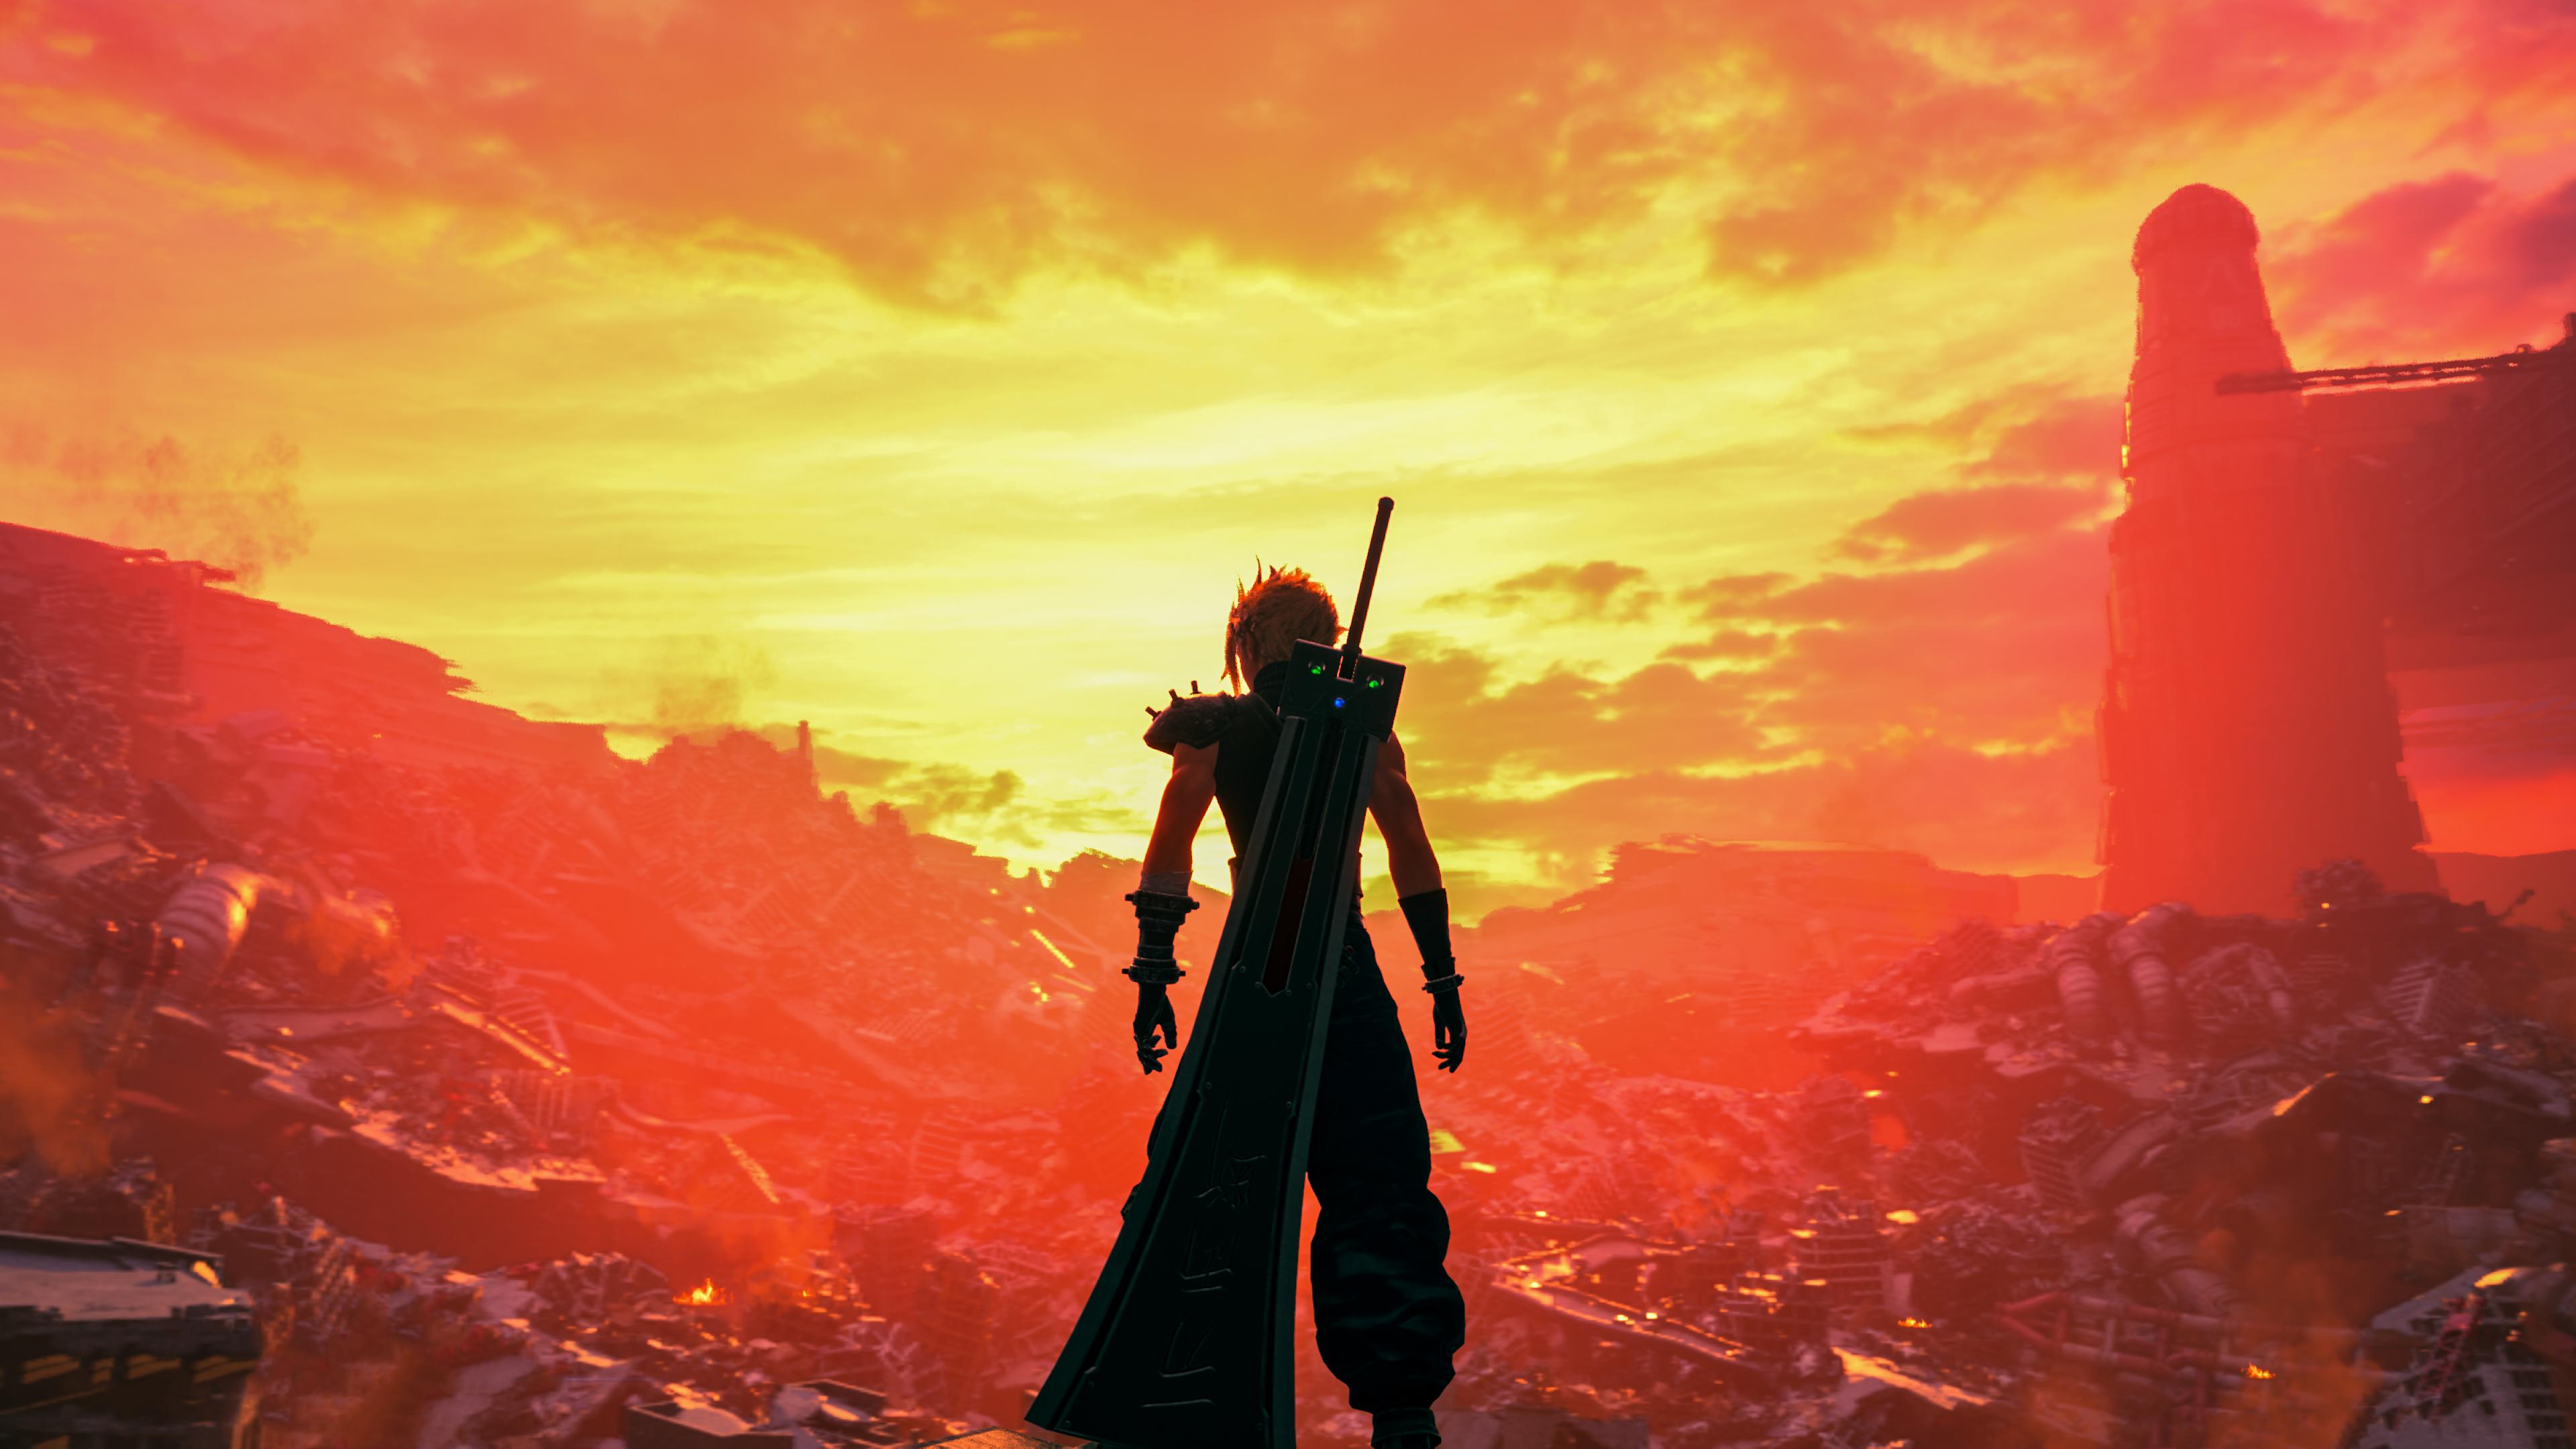 Final Fantasy VII Remake 2020 Wallpaper, HD Games 4K ...